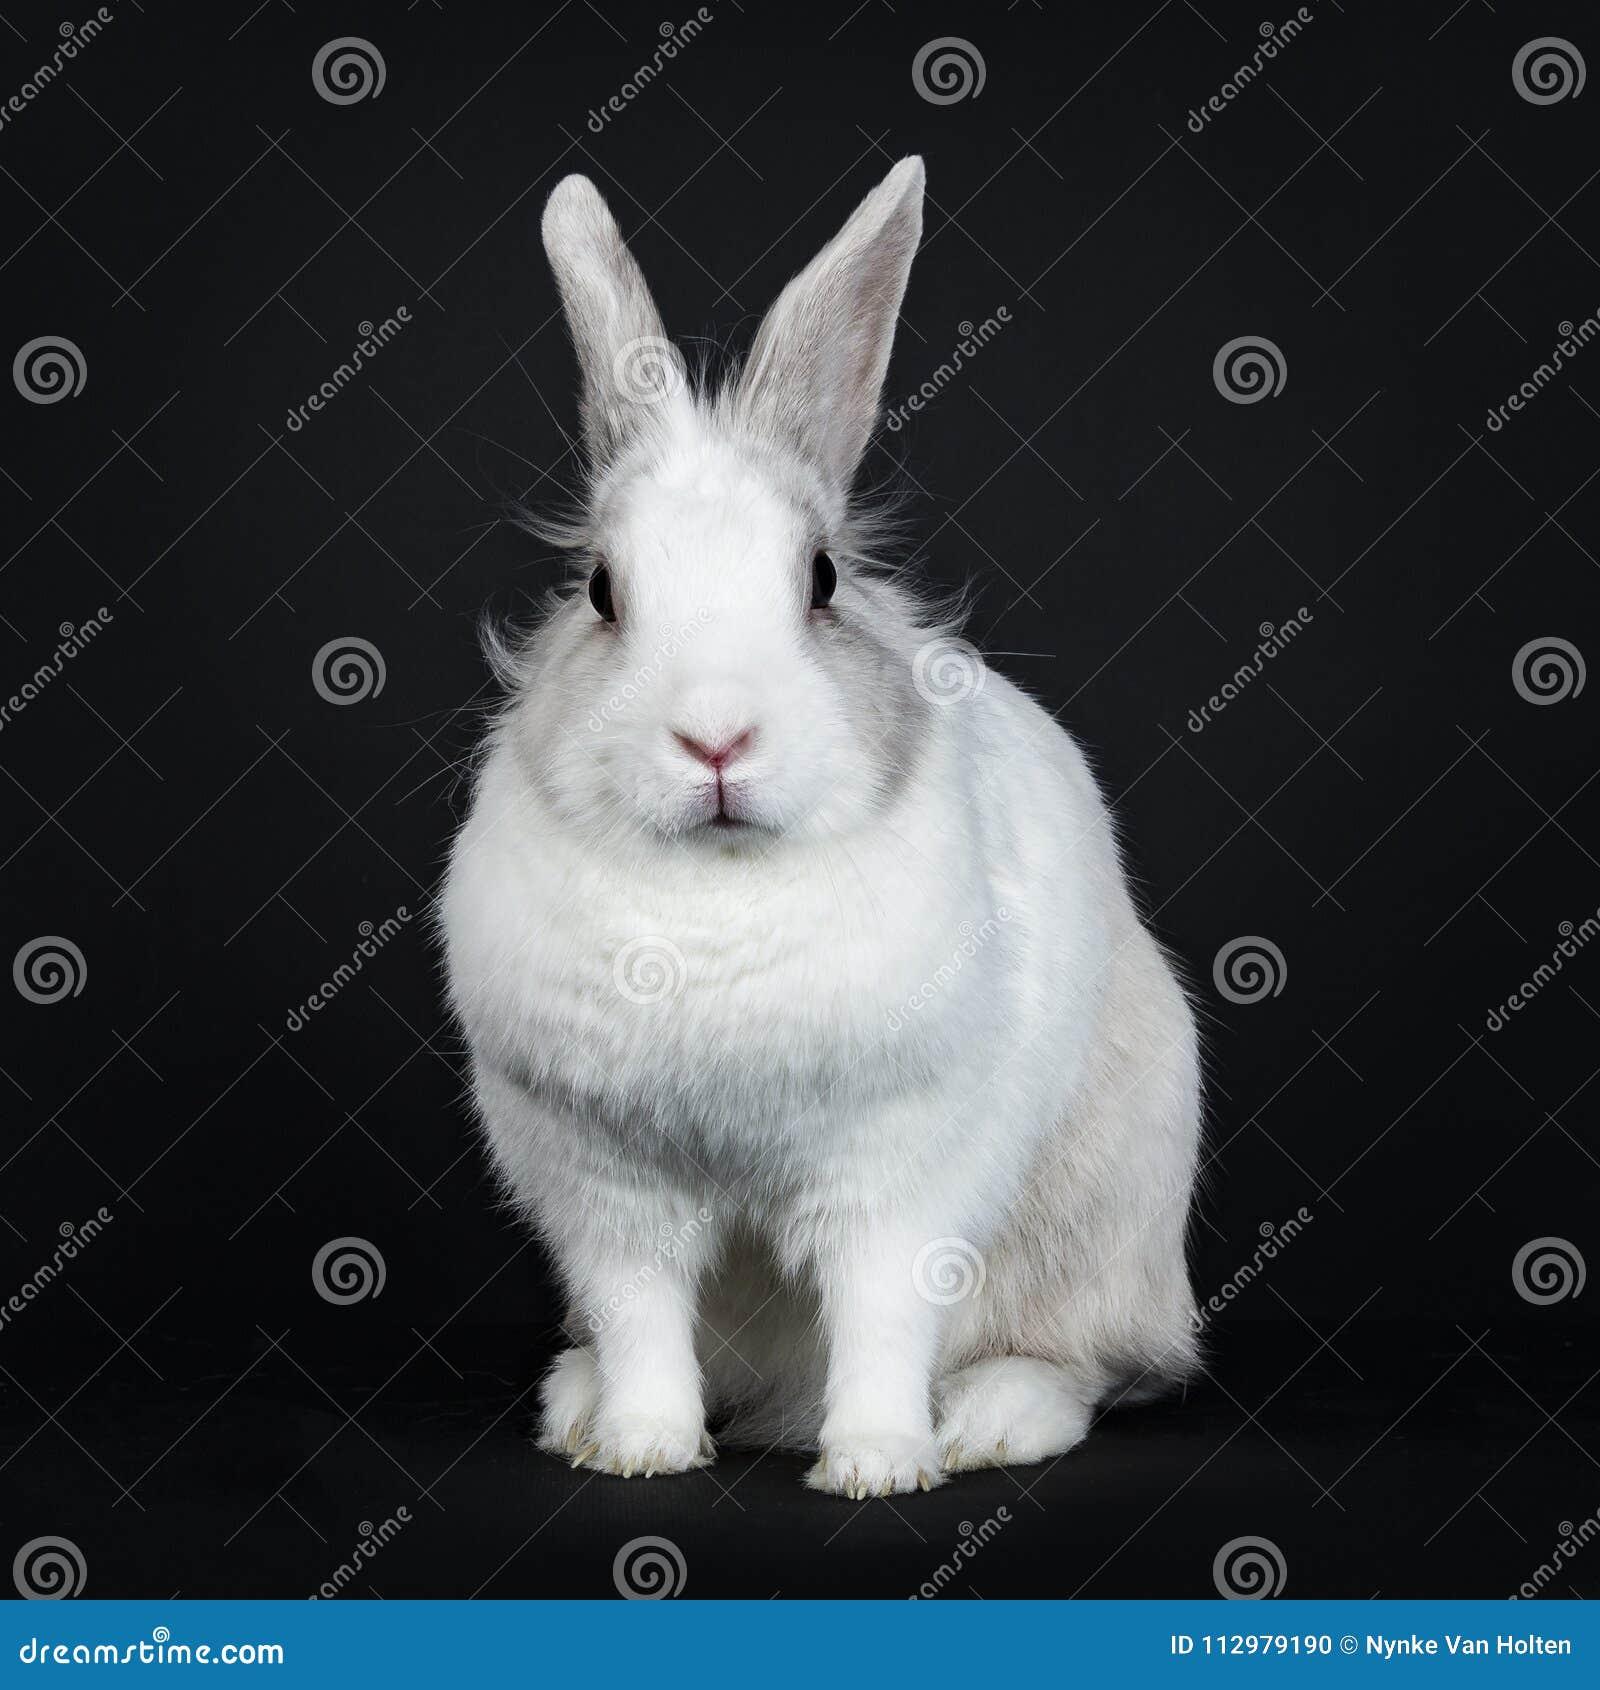 White with grey rabbit on black background